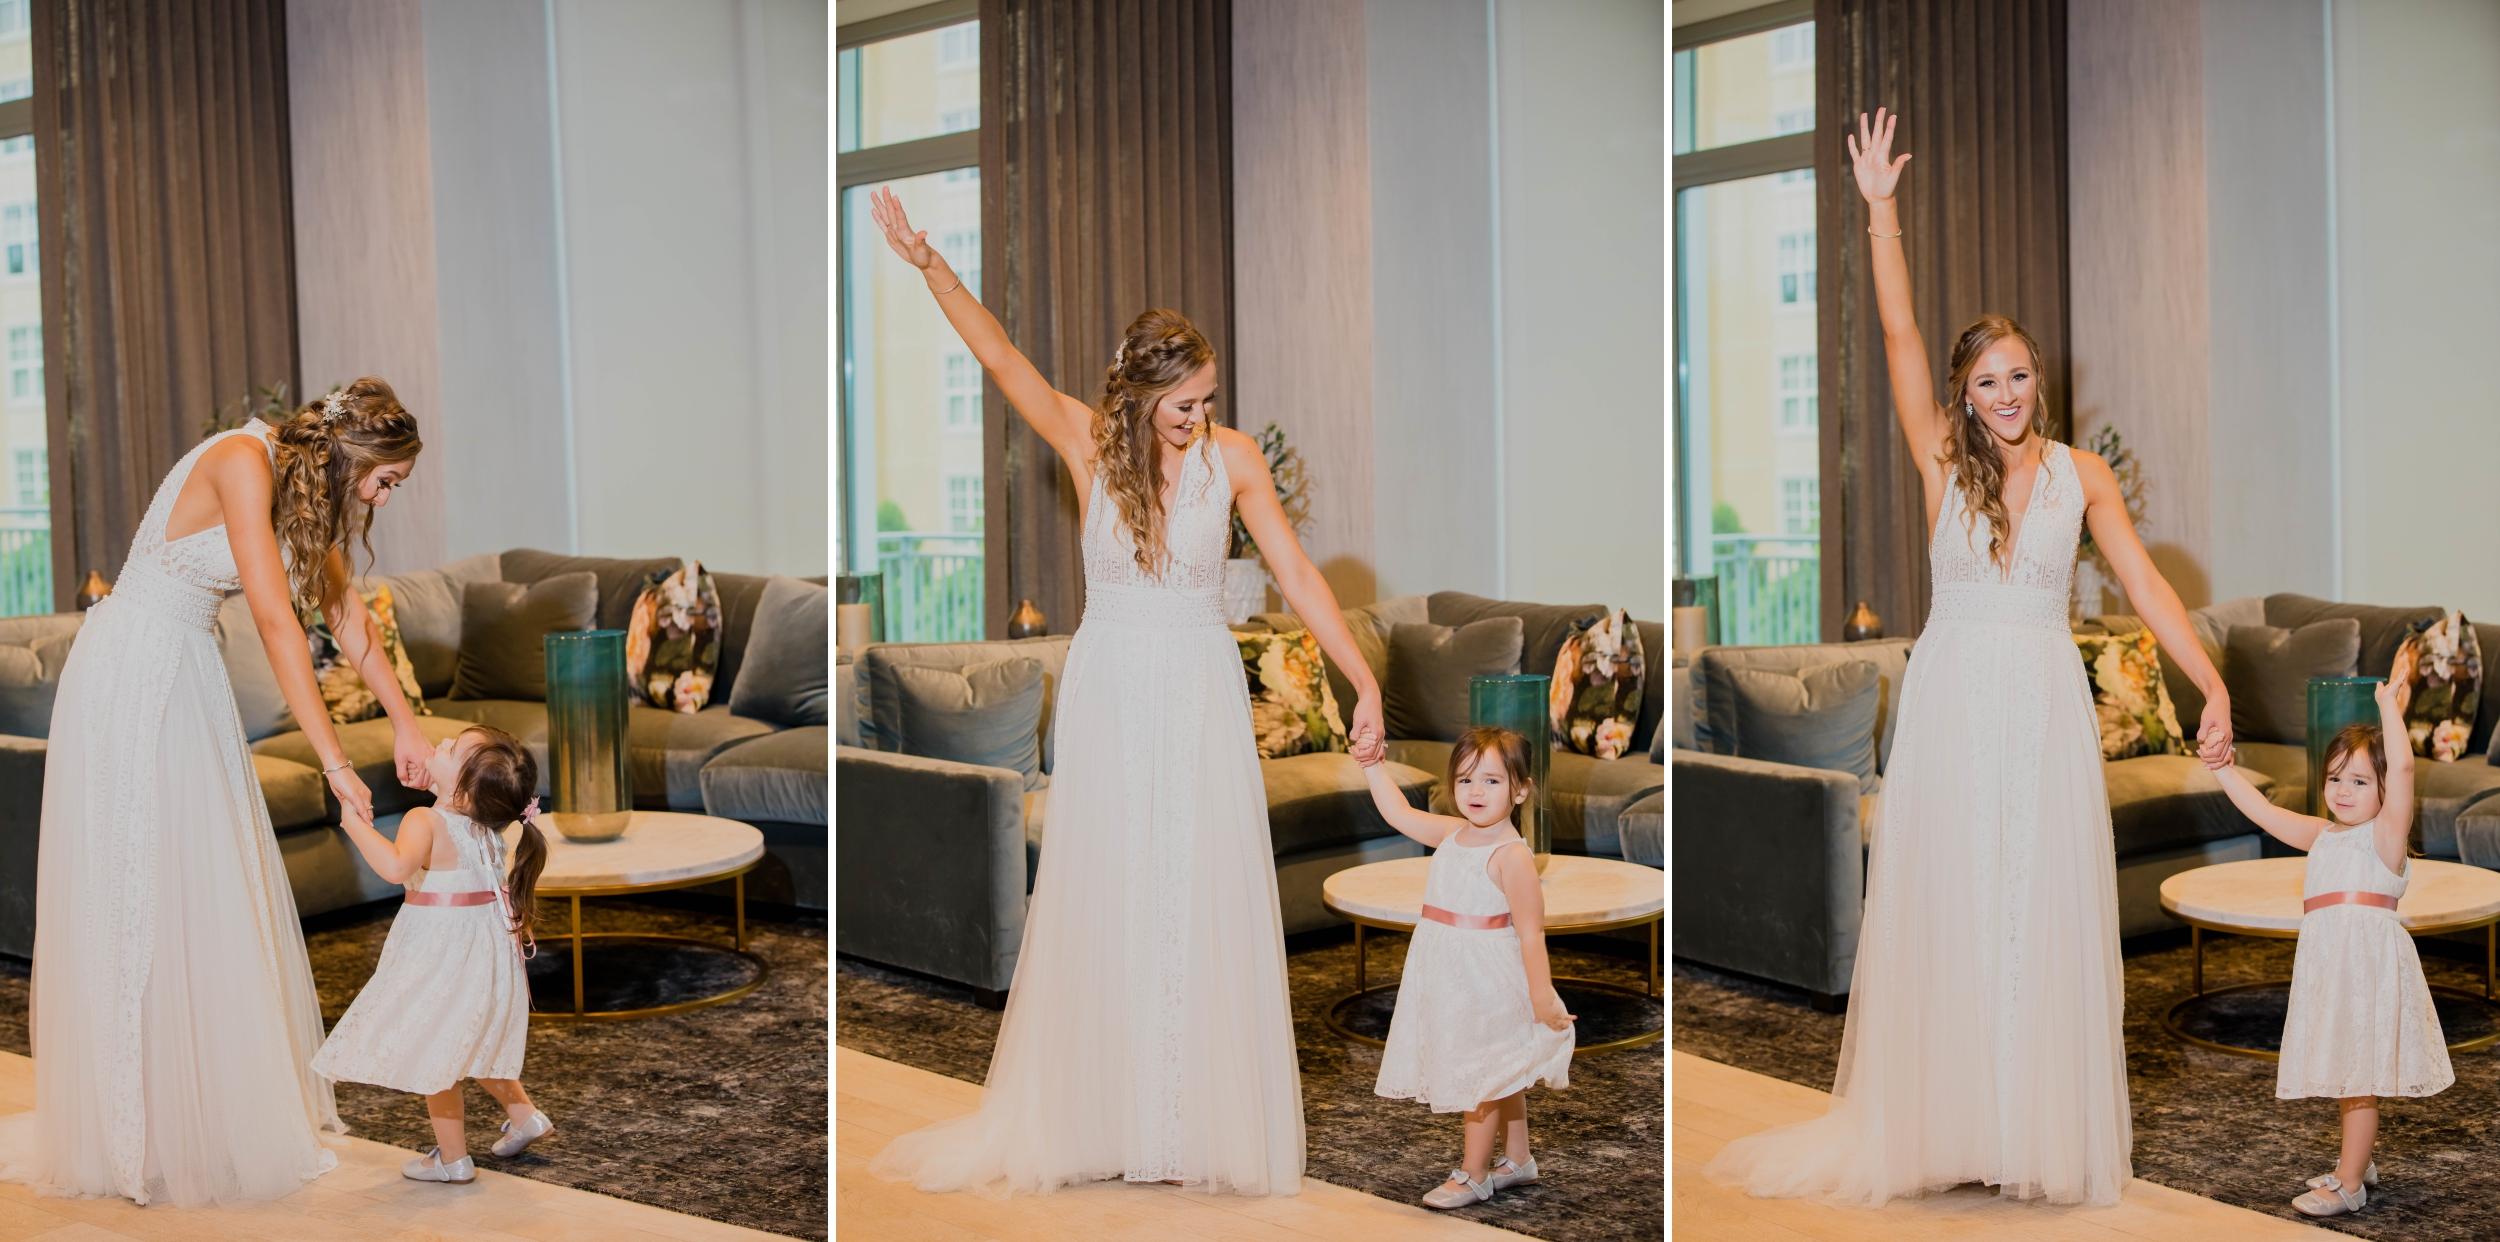 Wedding Piedmont Park - Magnolia Hall - Santy Martinez Photography 19.jpg